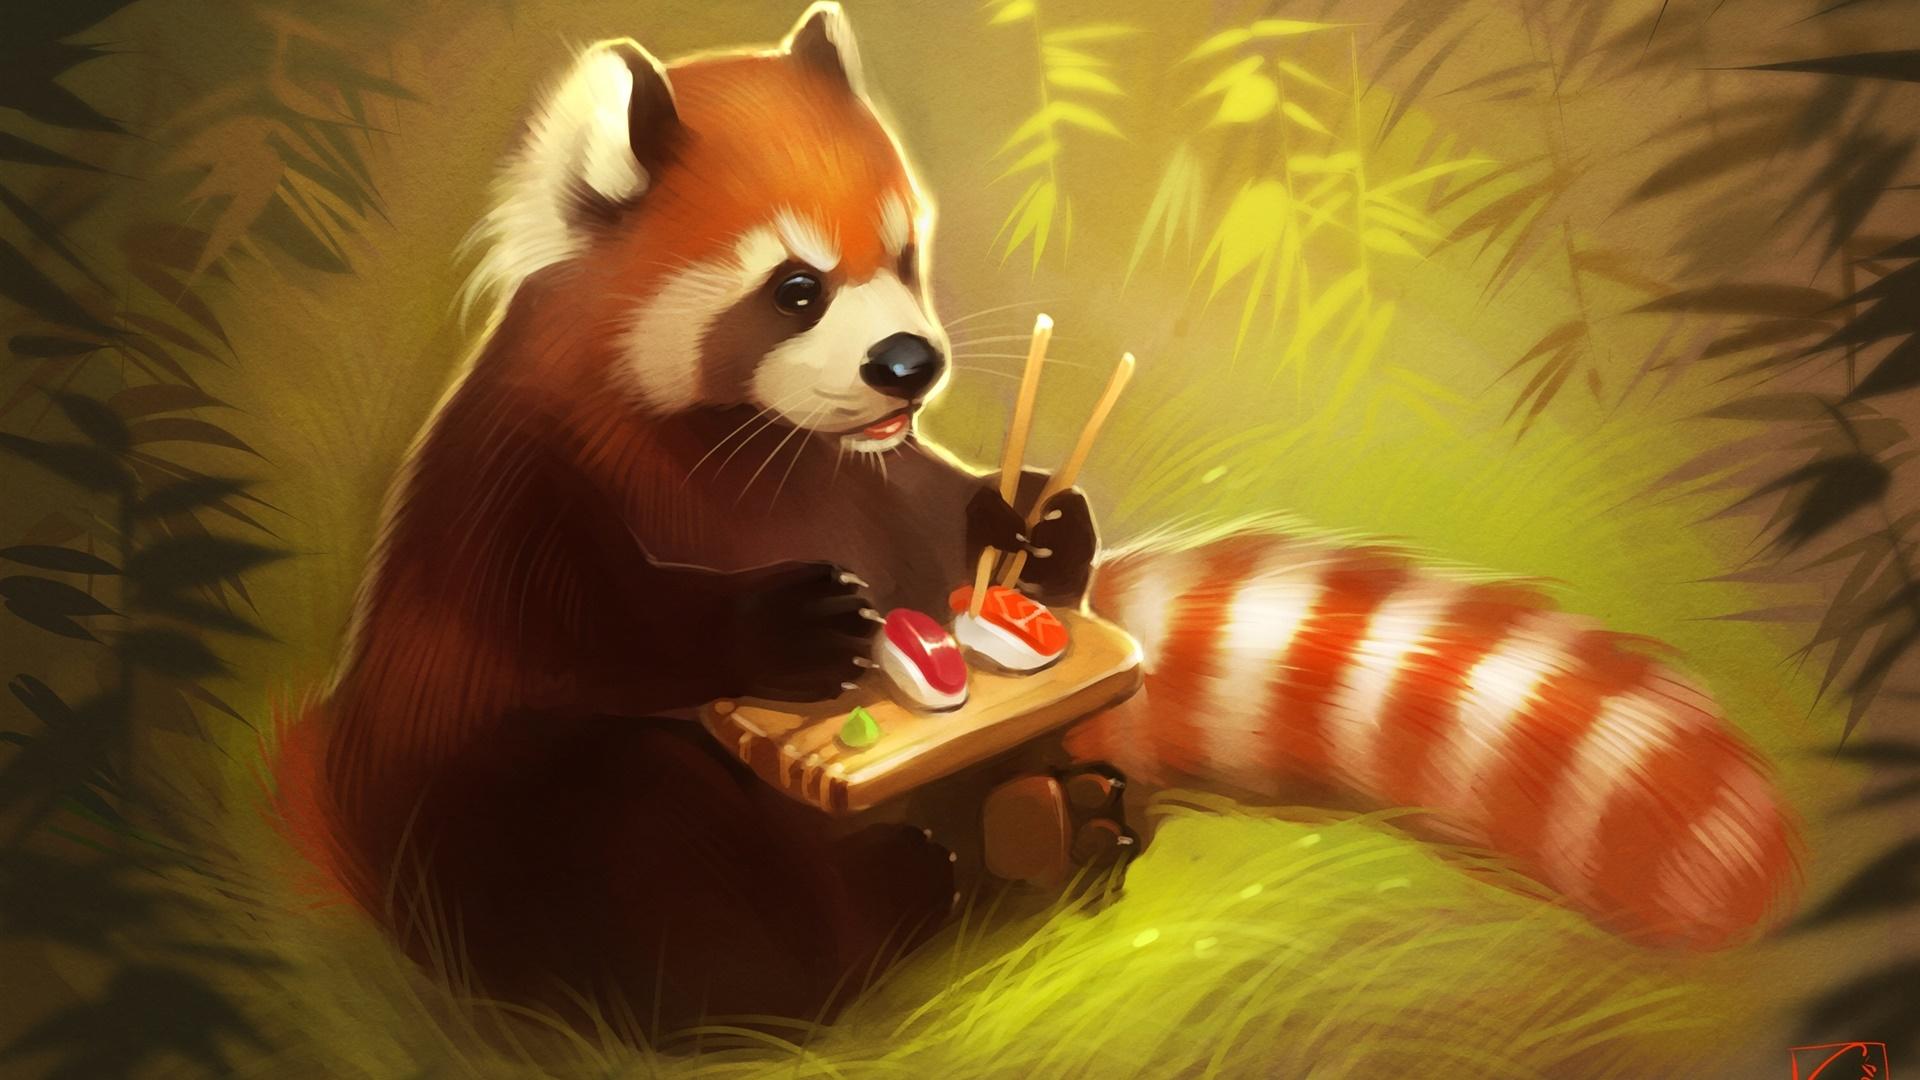 Alimentaire Rouge Panda Manger Sushi Ours Peinture Creative Fonds D Ecran 1920x1080 Fond D Ecran Telecharger Fr Hdwall365 Com